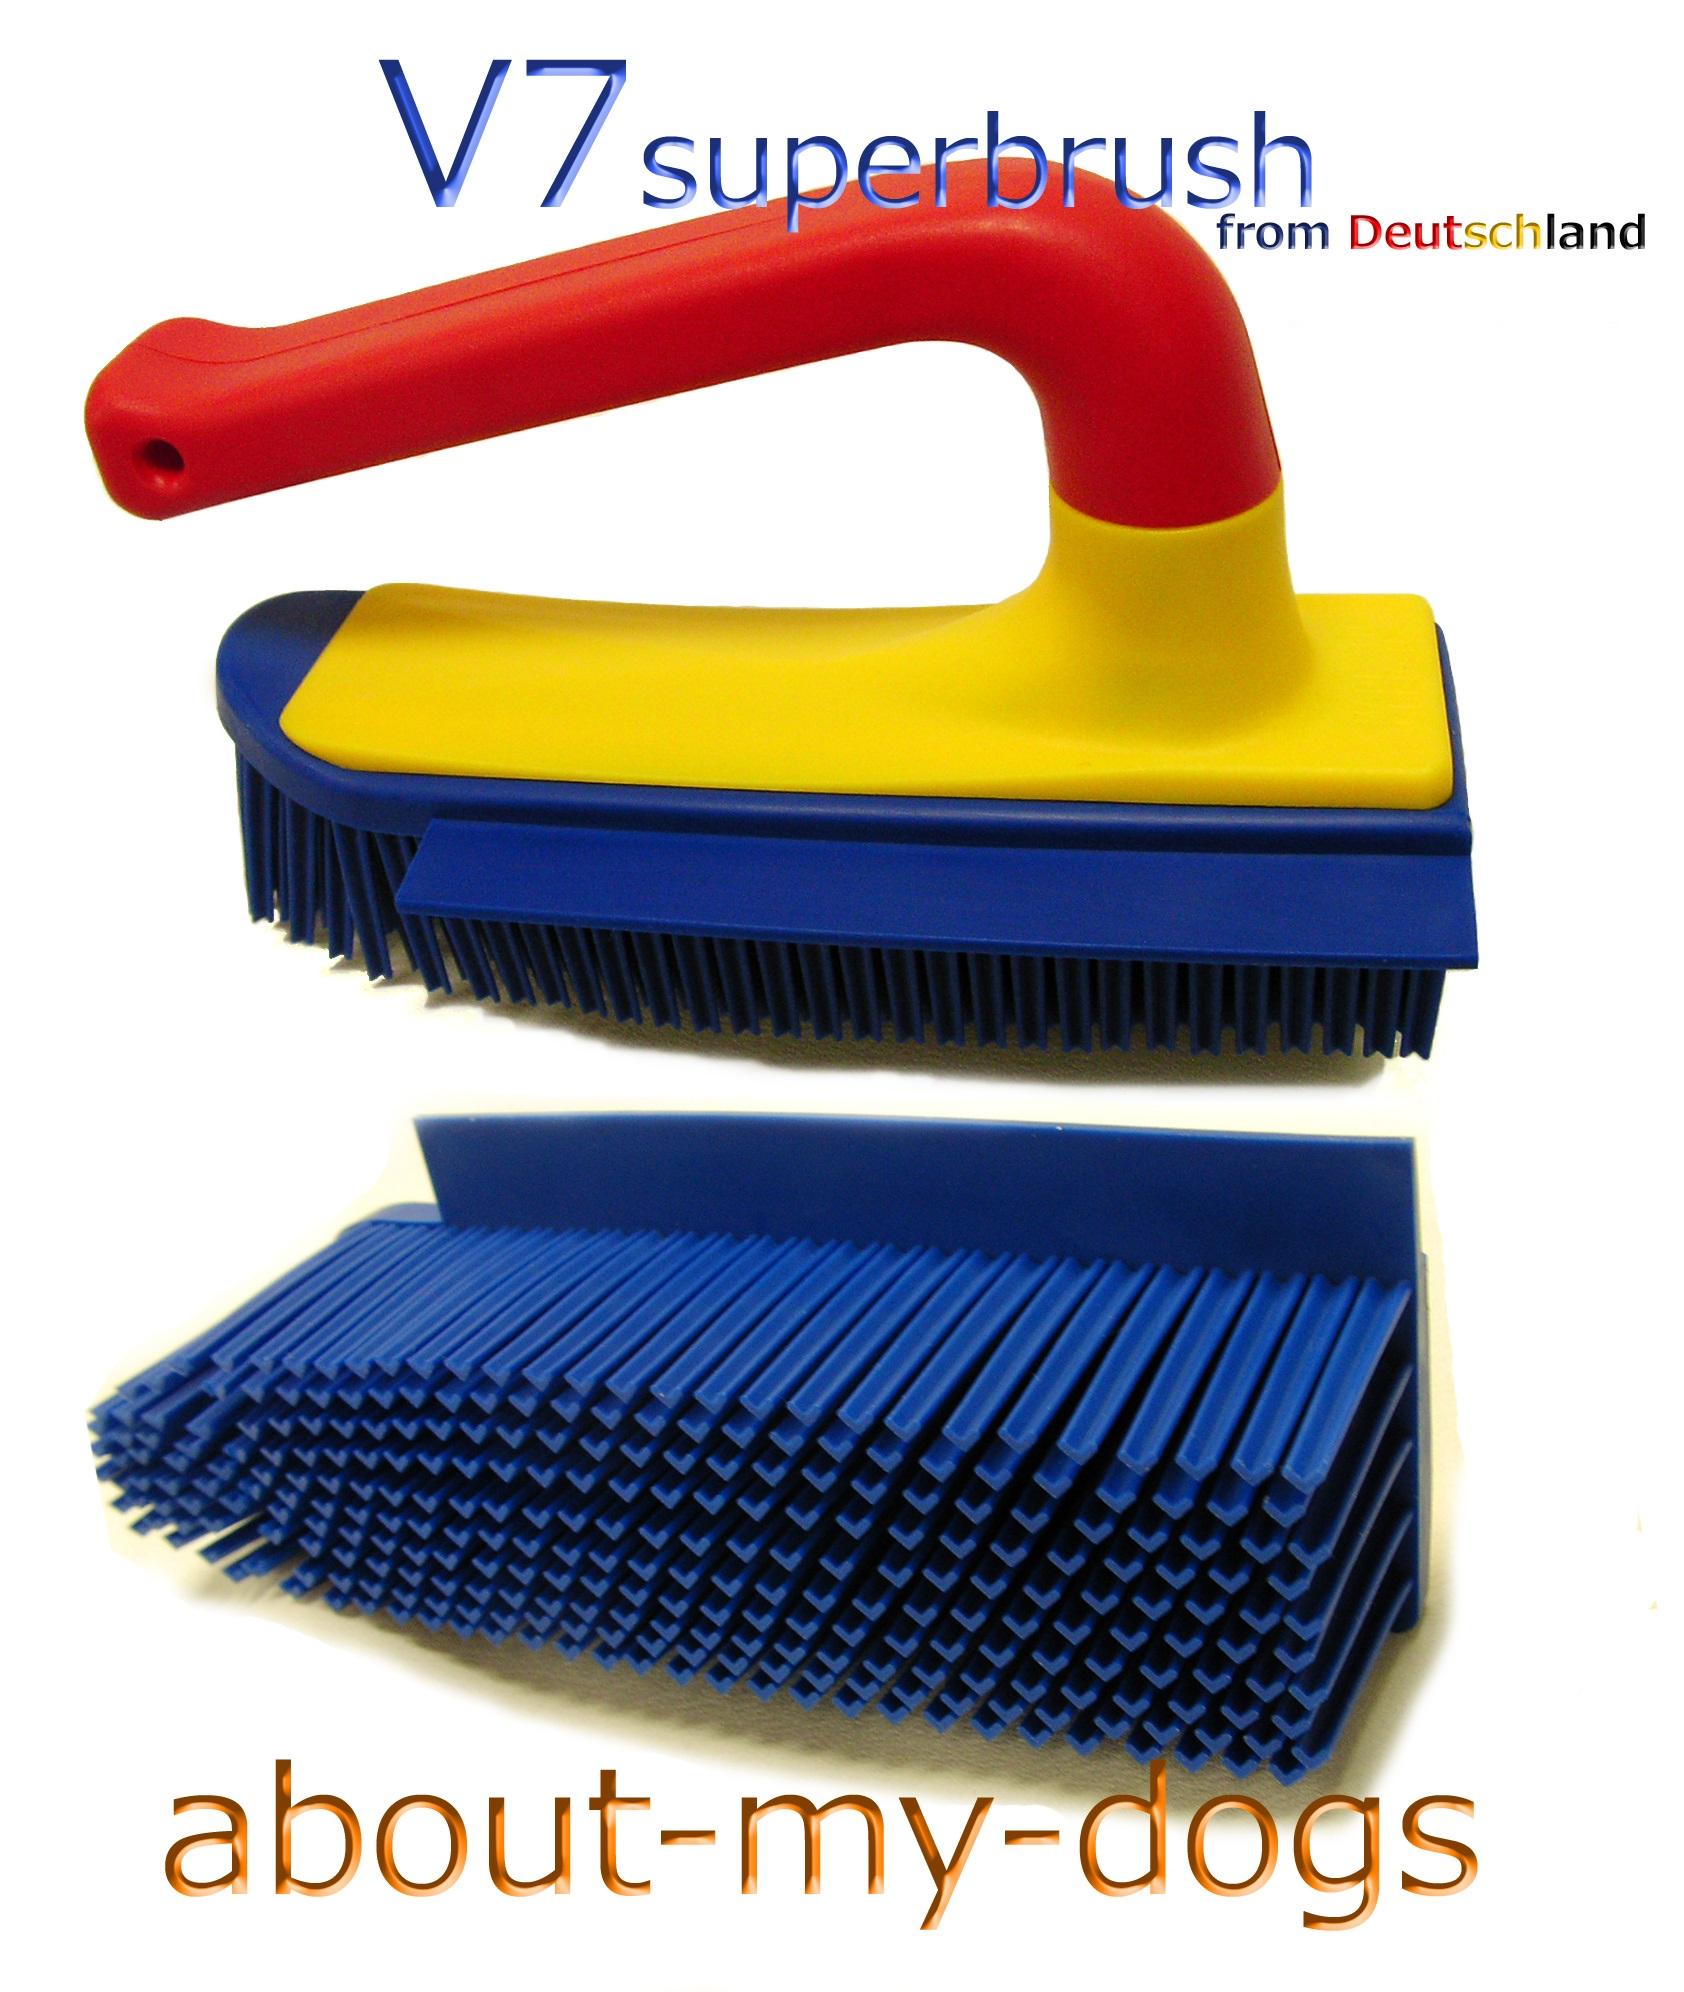 V7スーパーブラシハンディ 愛犬の毛の掃除に欠かせません!